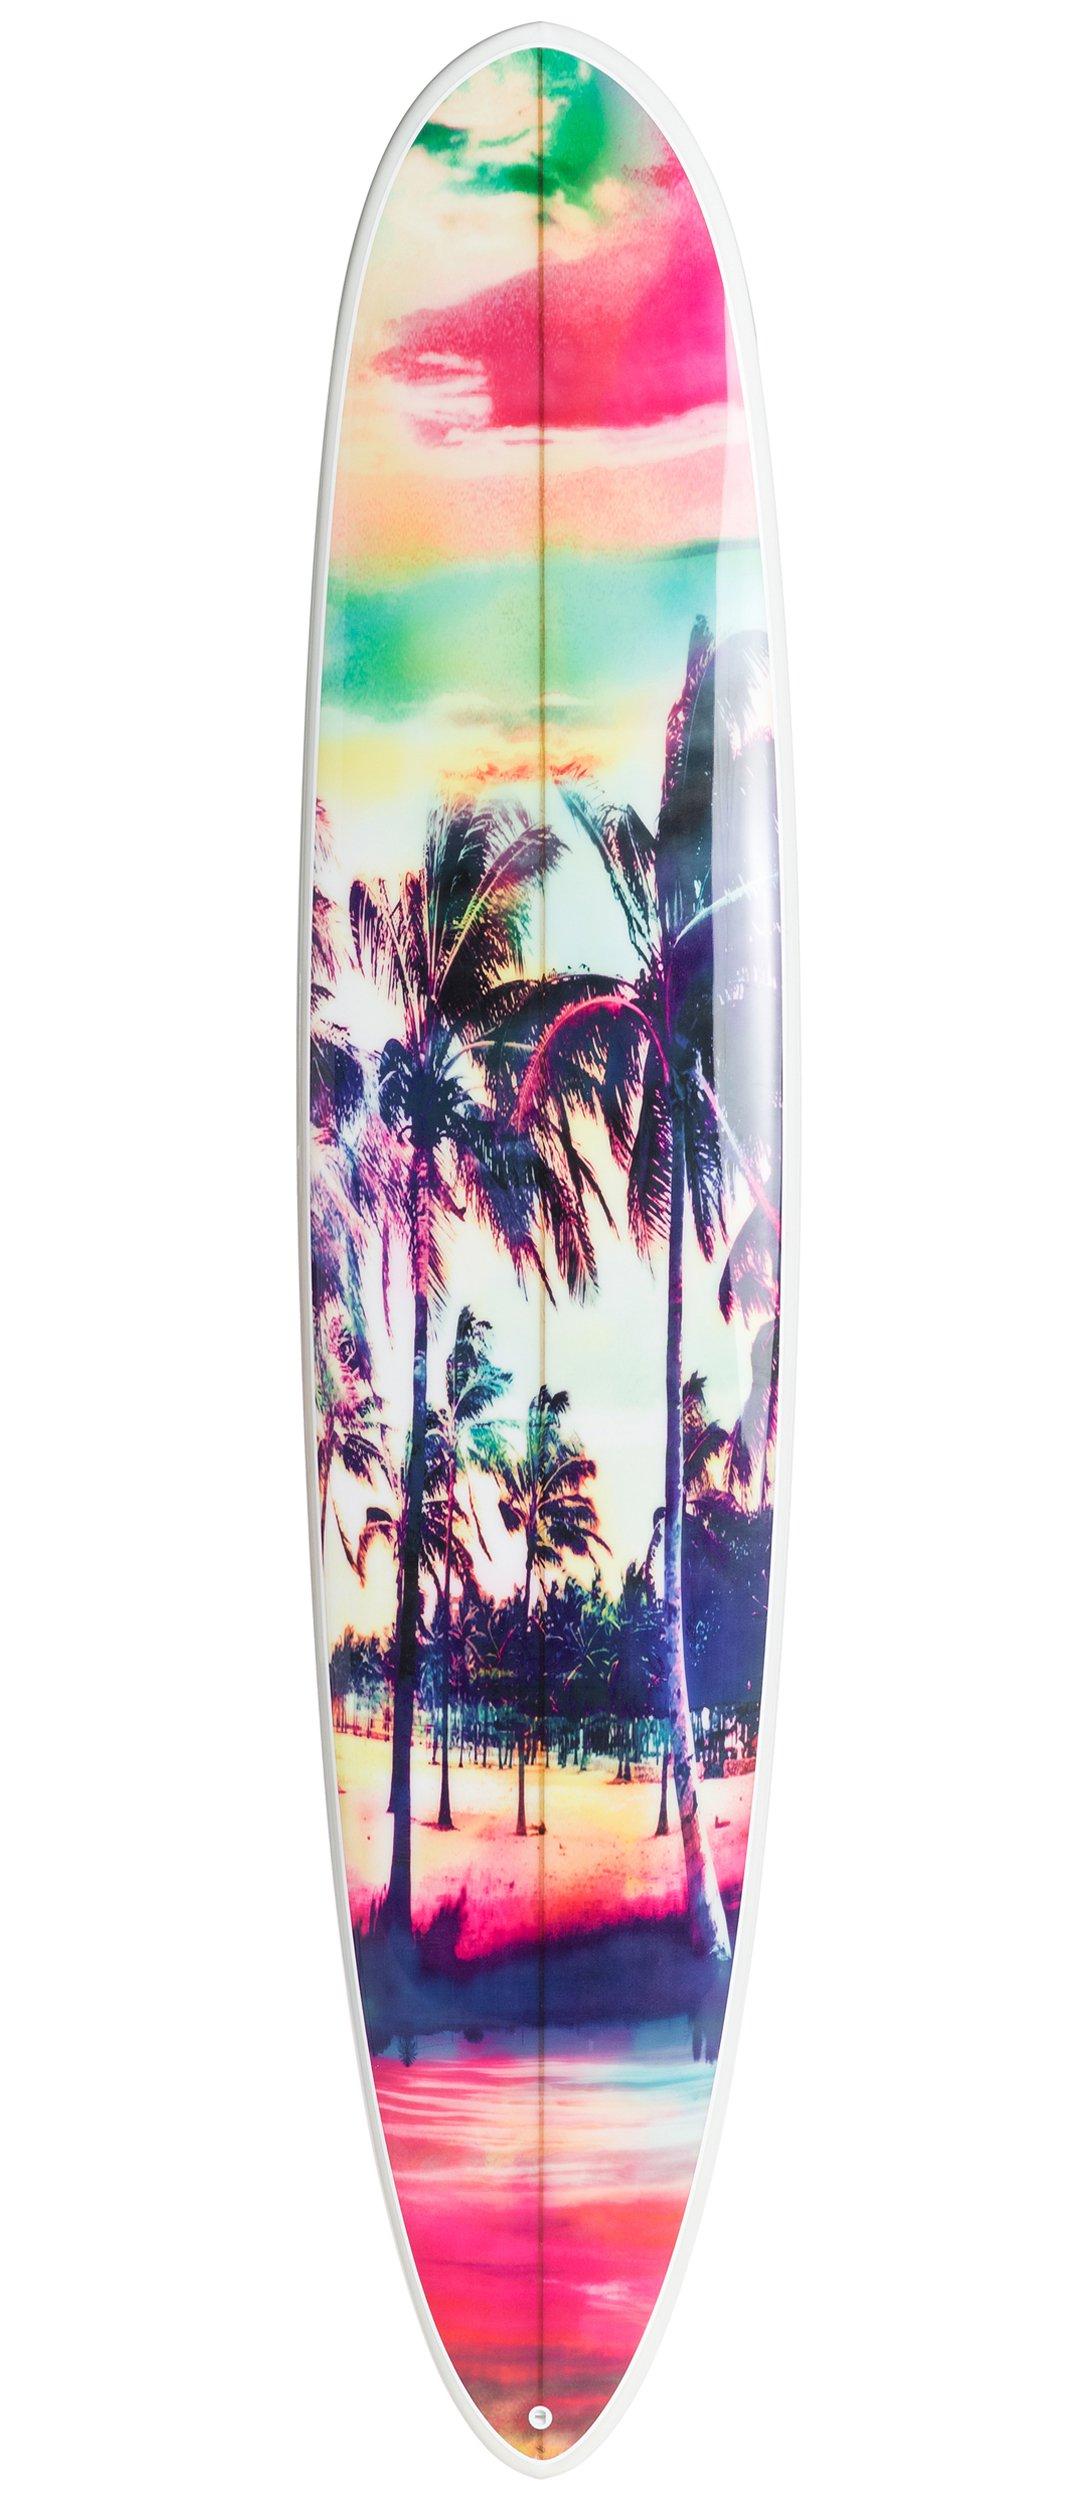 http://content.quiksilver.com/www/2014.quiksilver.com/html/upload/surf/surfboards/__id-150--9-LGB-RX-PALM-front.jpg Quiksilver Surfboards